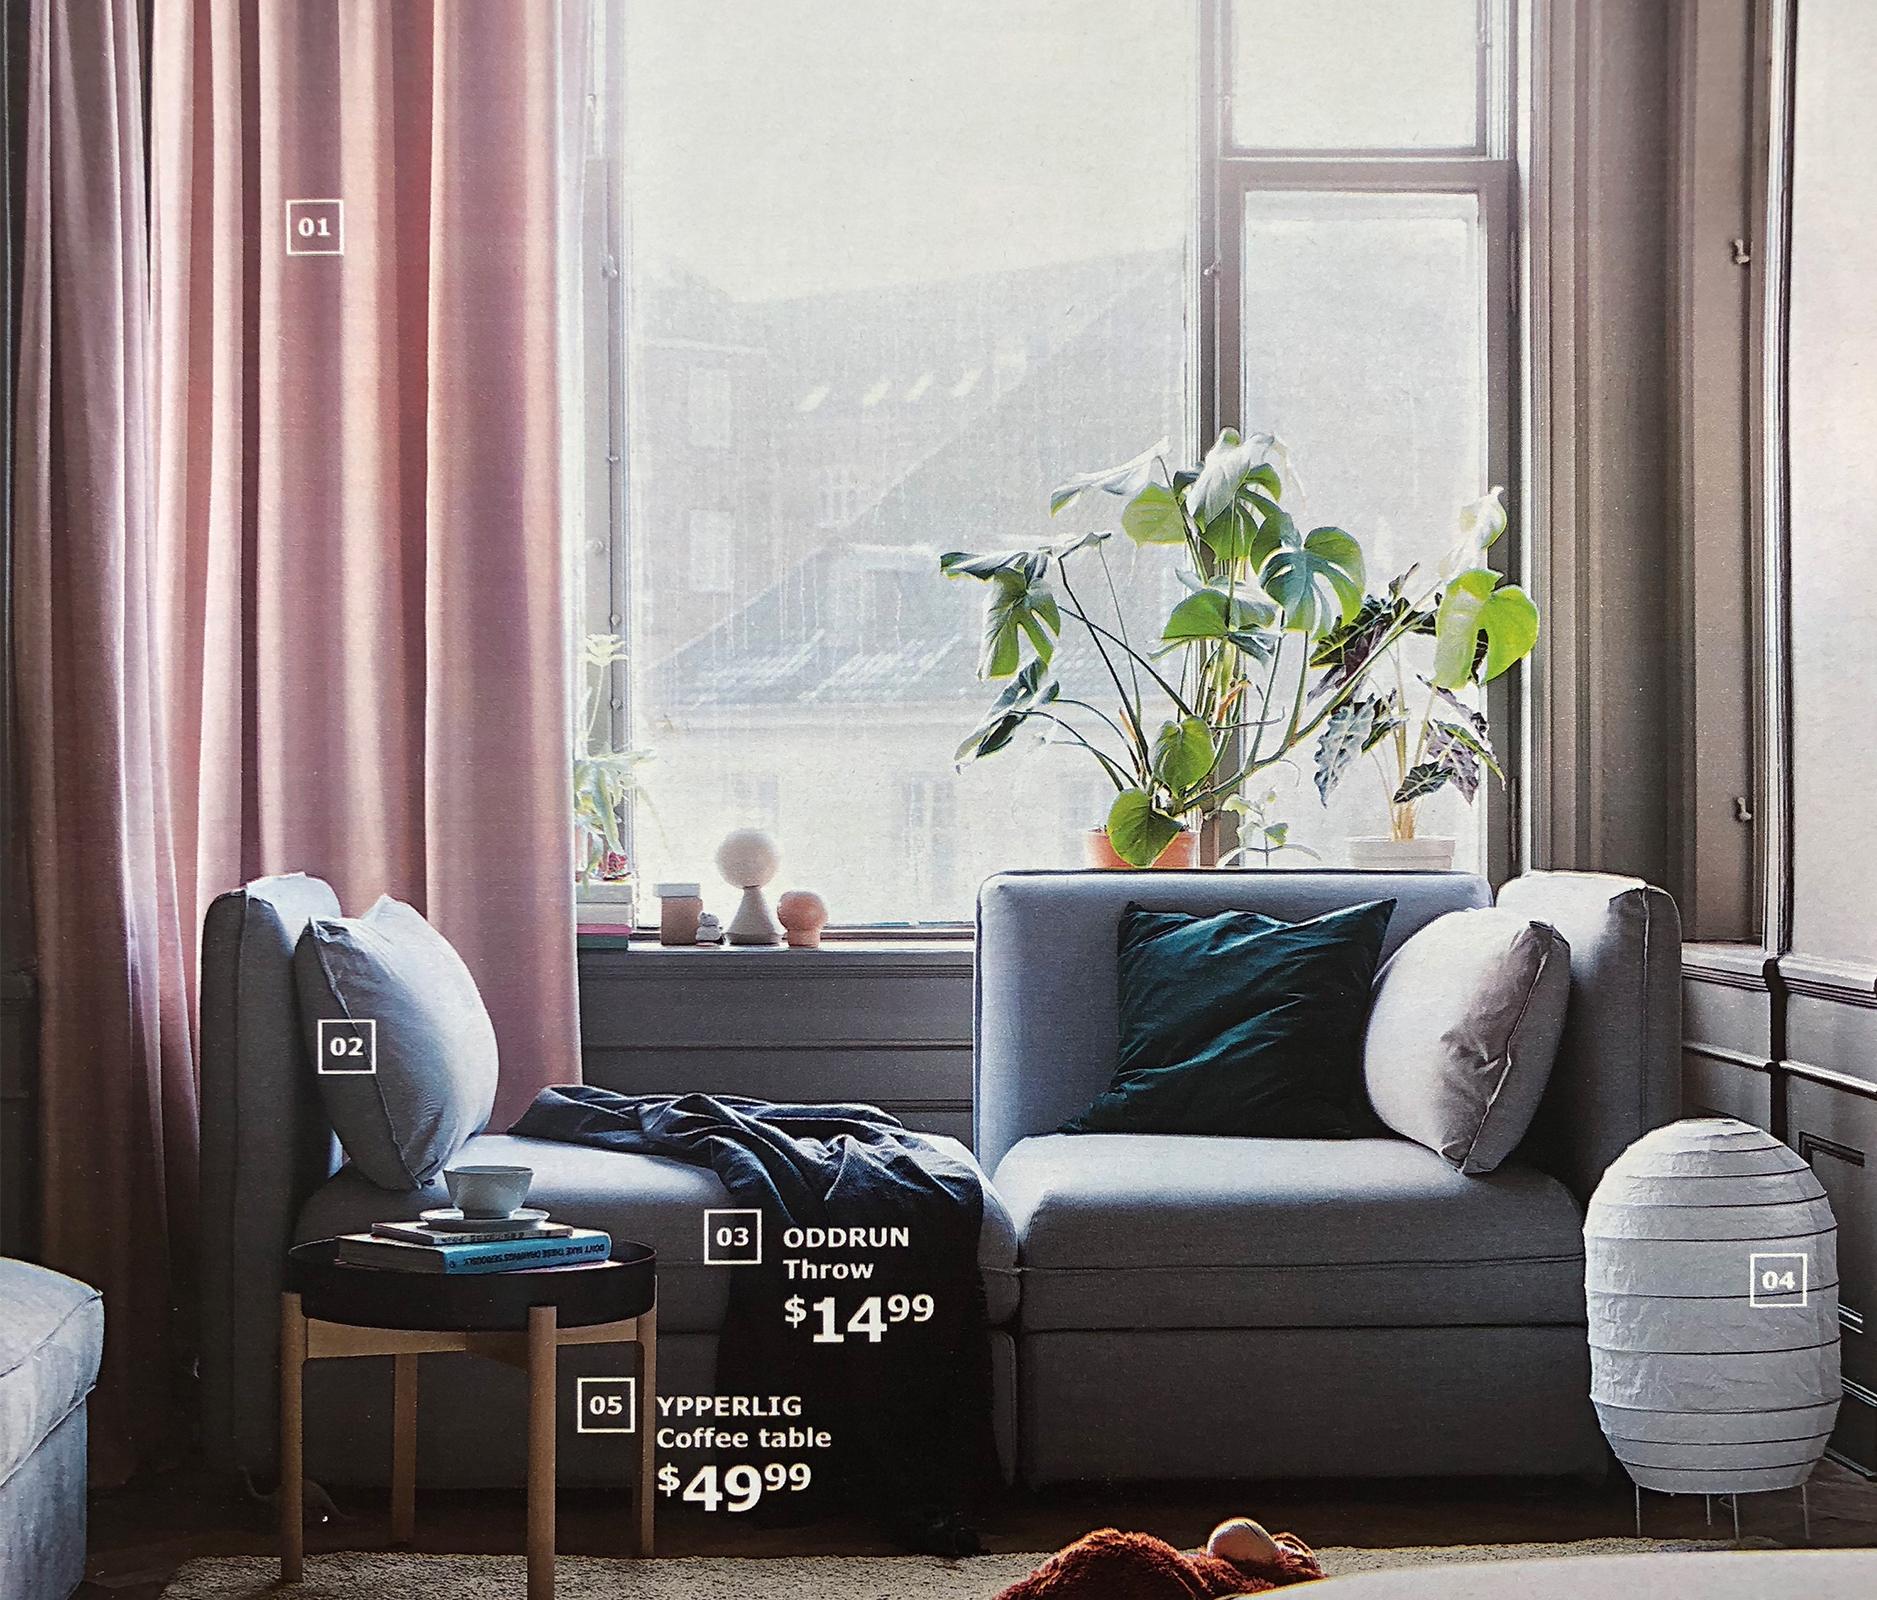 Ikea Catalog 2019 11 Bright Bazaar By Will Taylor